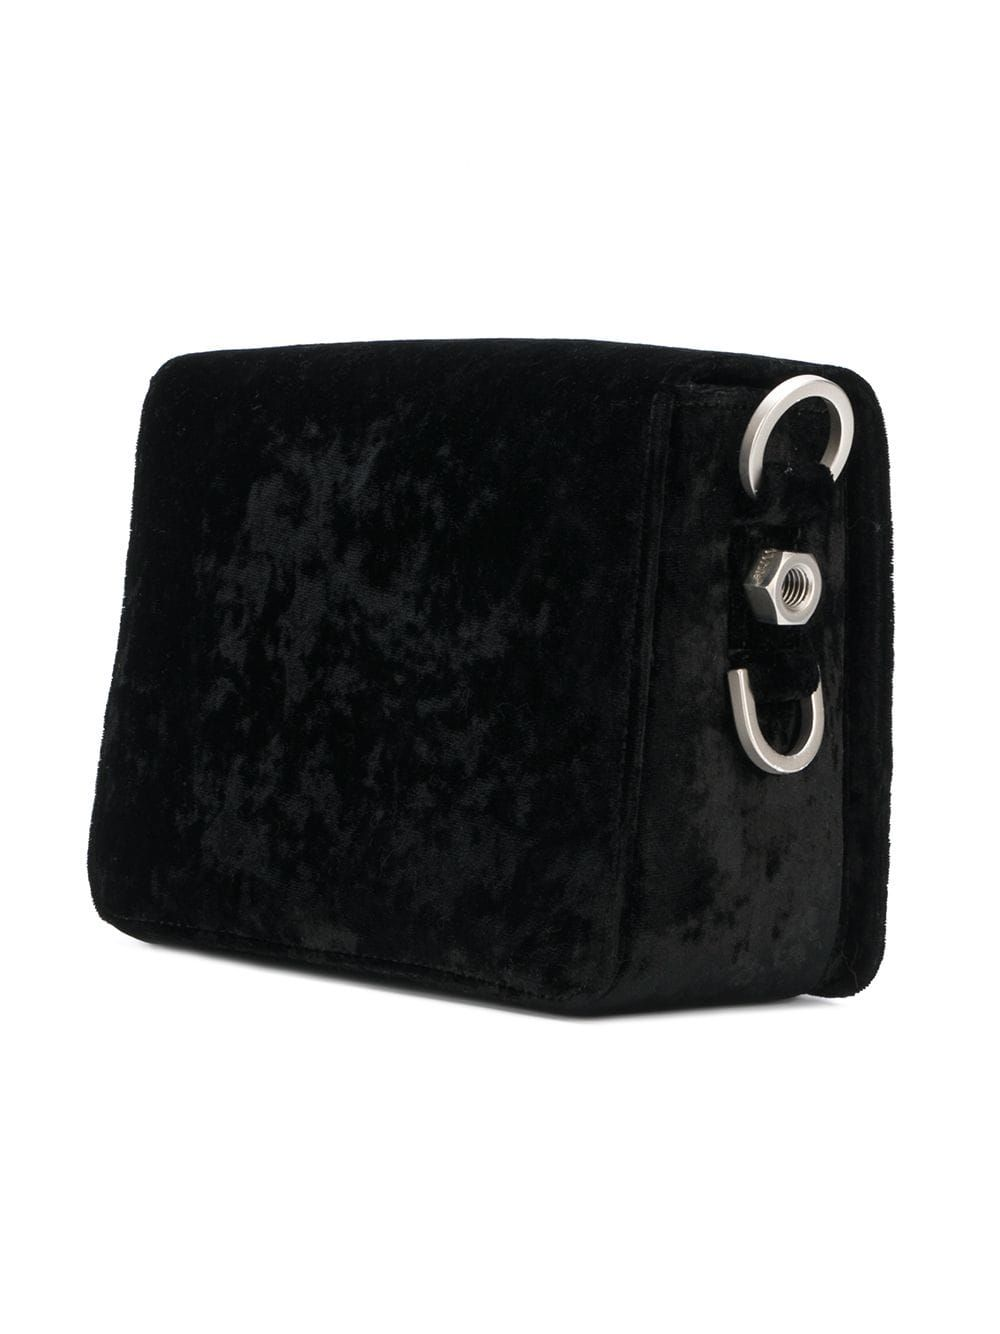 Vintage Off White Velour Flap Crossbody Bag Black